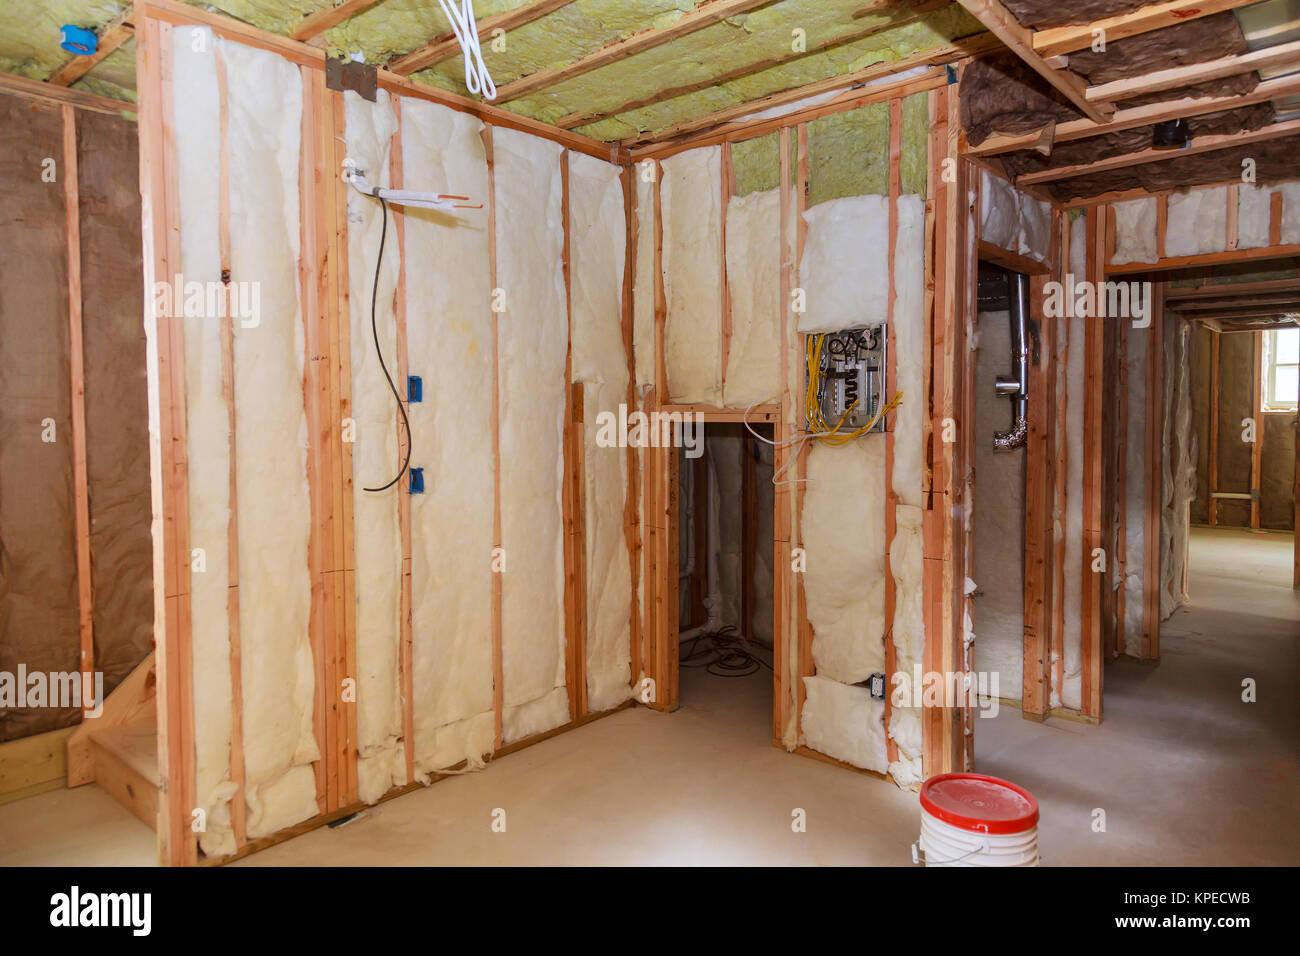 House Insulation Installation Stockfotos & House Insulation ...